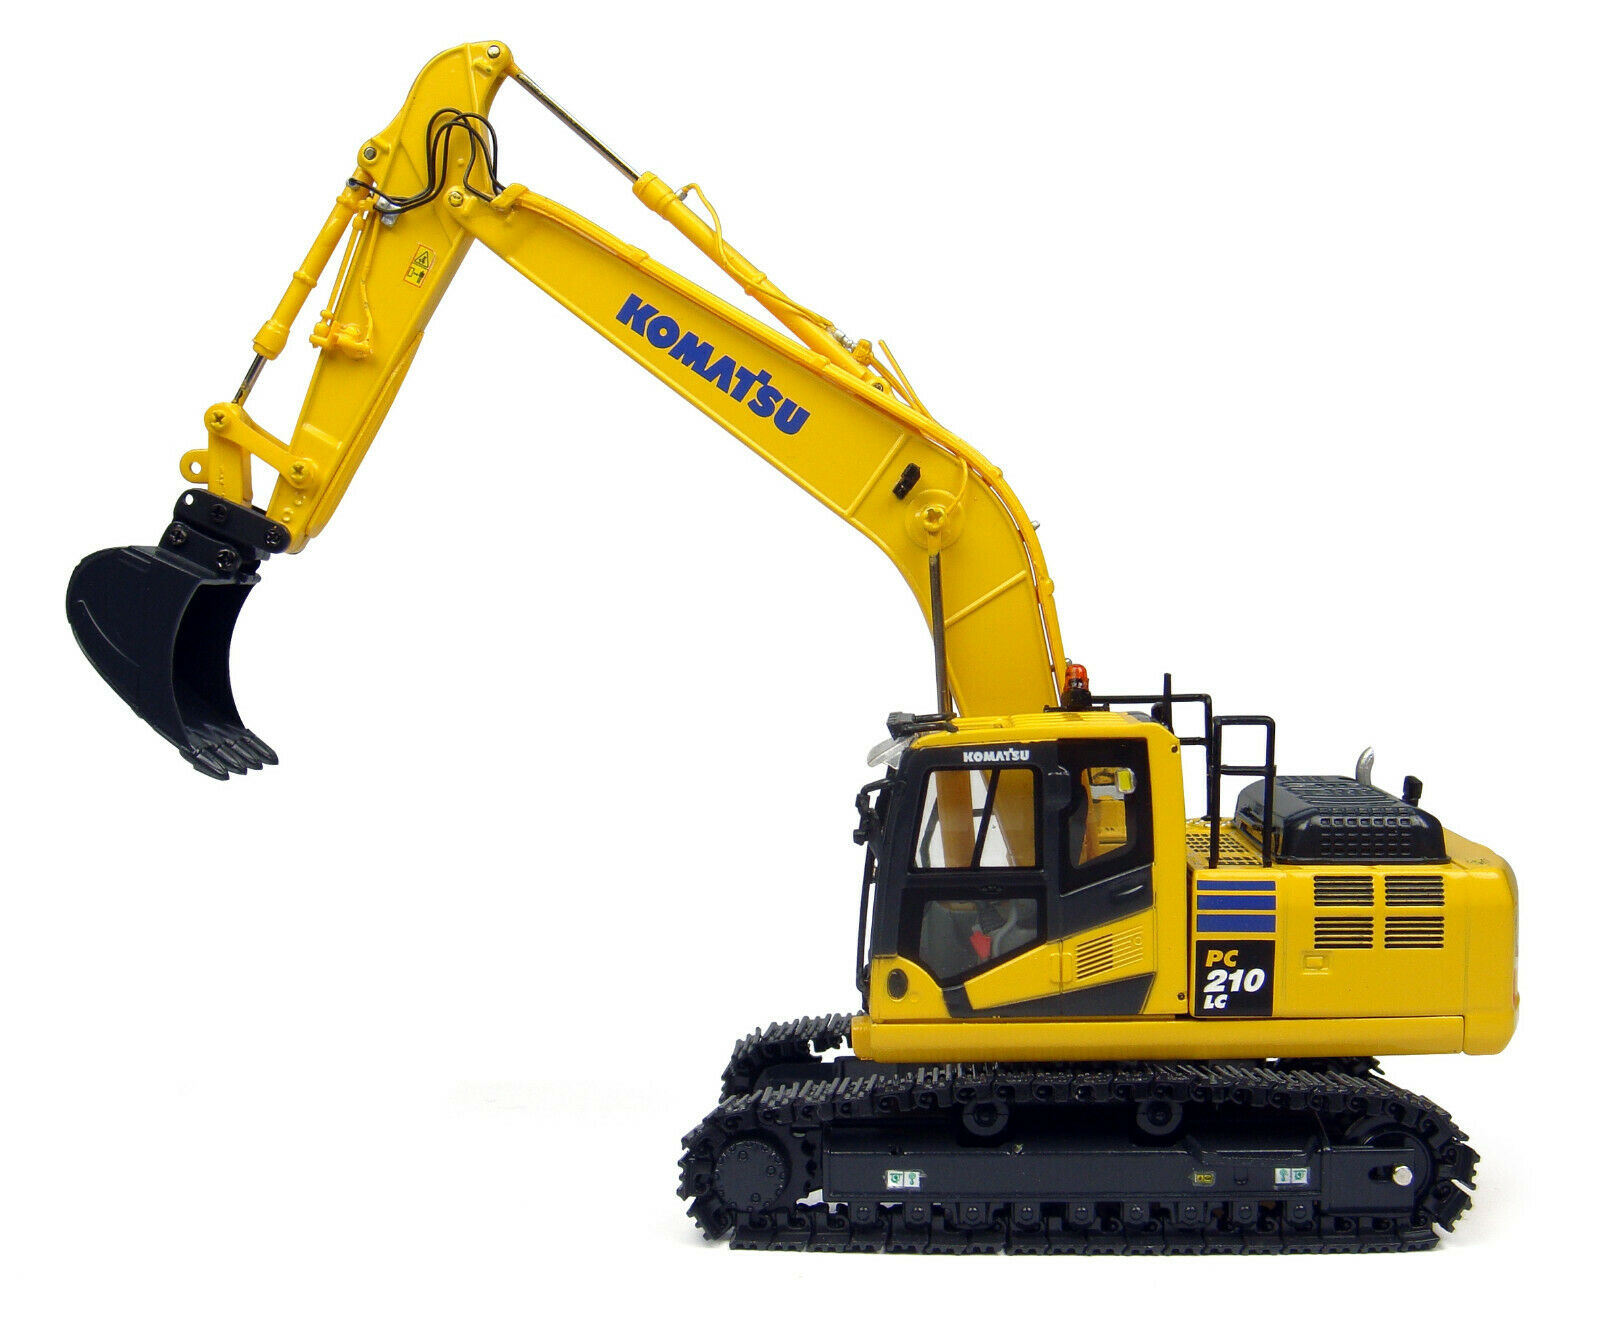 Komatsu PC210LC-10 chenilles Excavatrice 1 50 diecast modèle Universal Hobbies UH8093